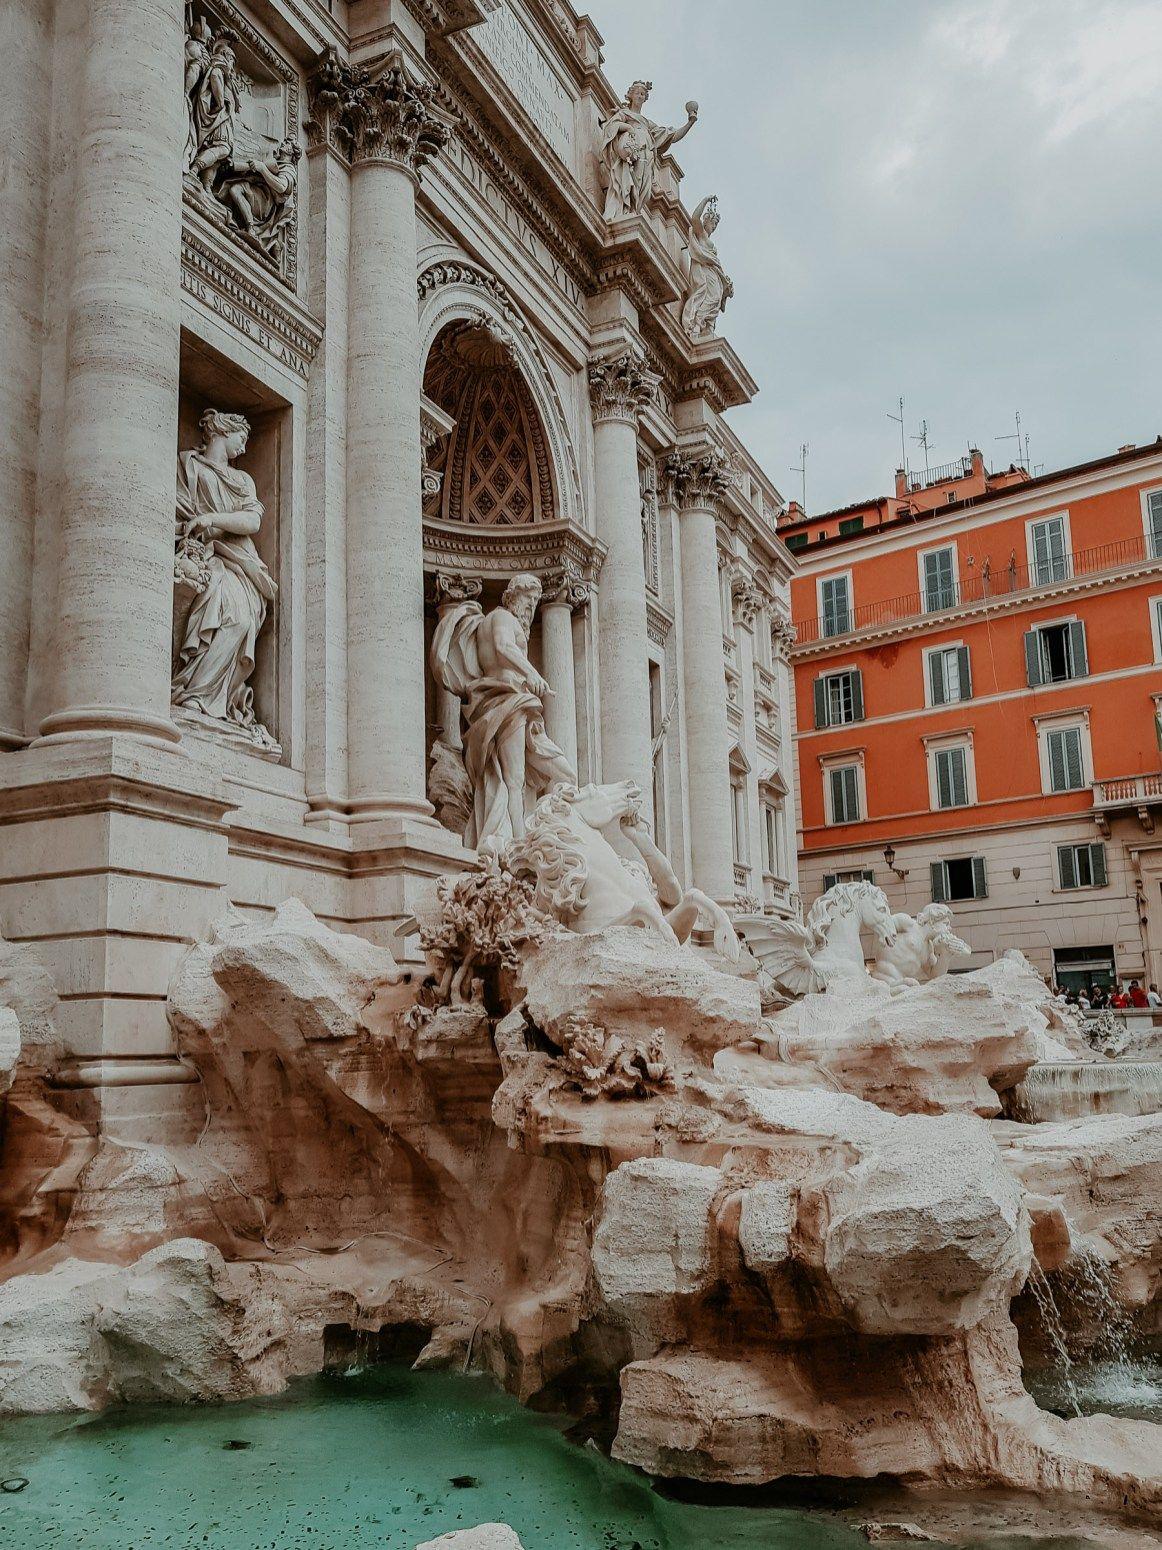 Rom 5 Klassiker In Der Ewigen Stadt Rom Rom Reise Petersdom Rom